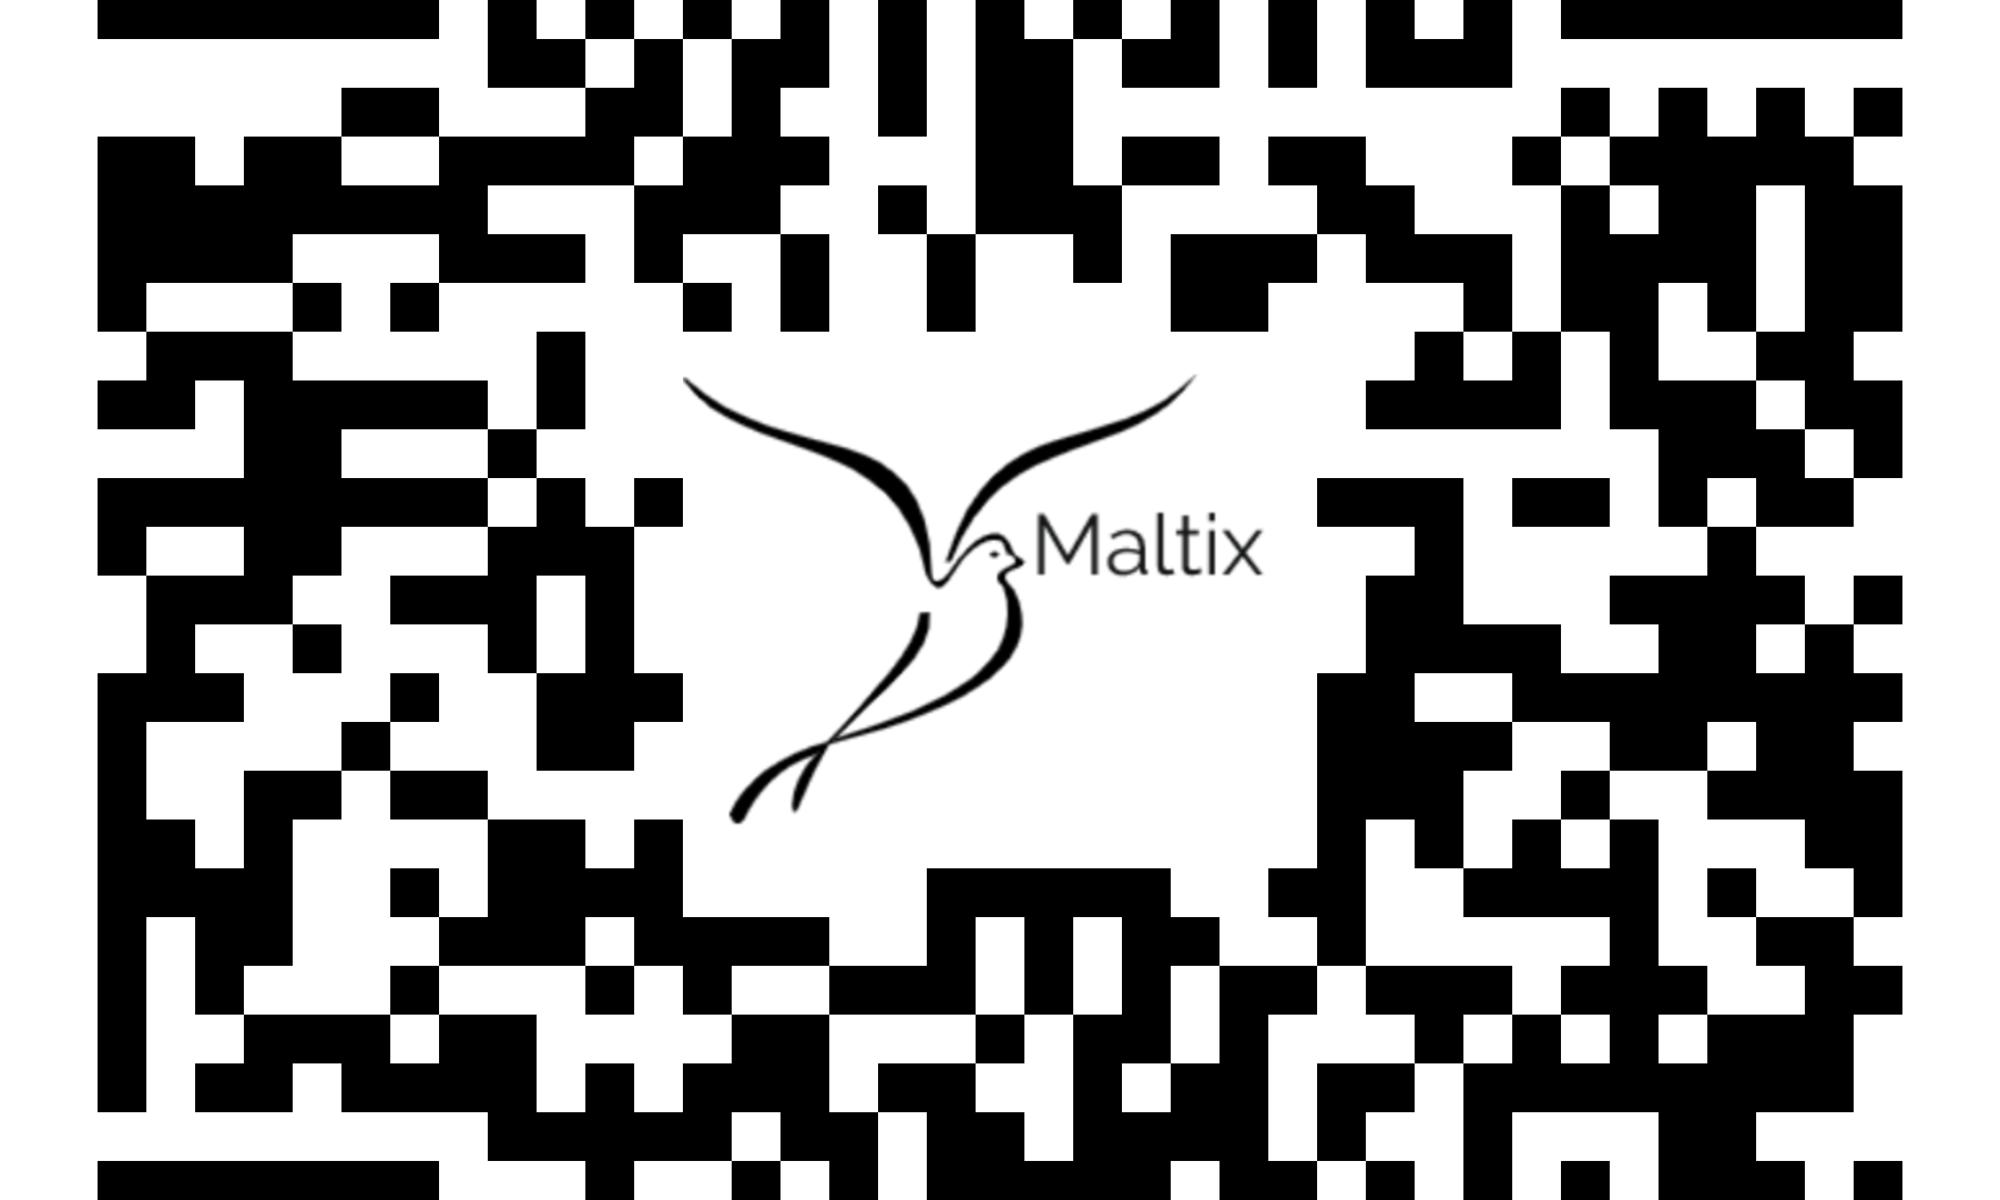 Maltix